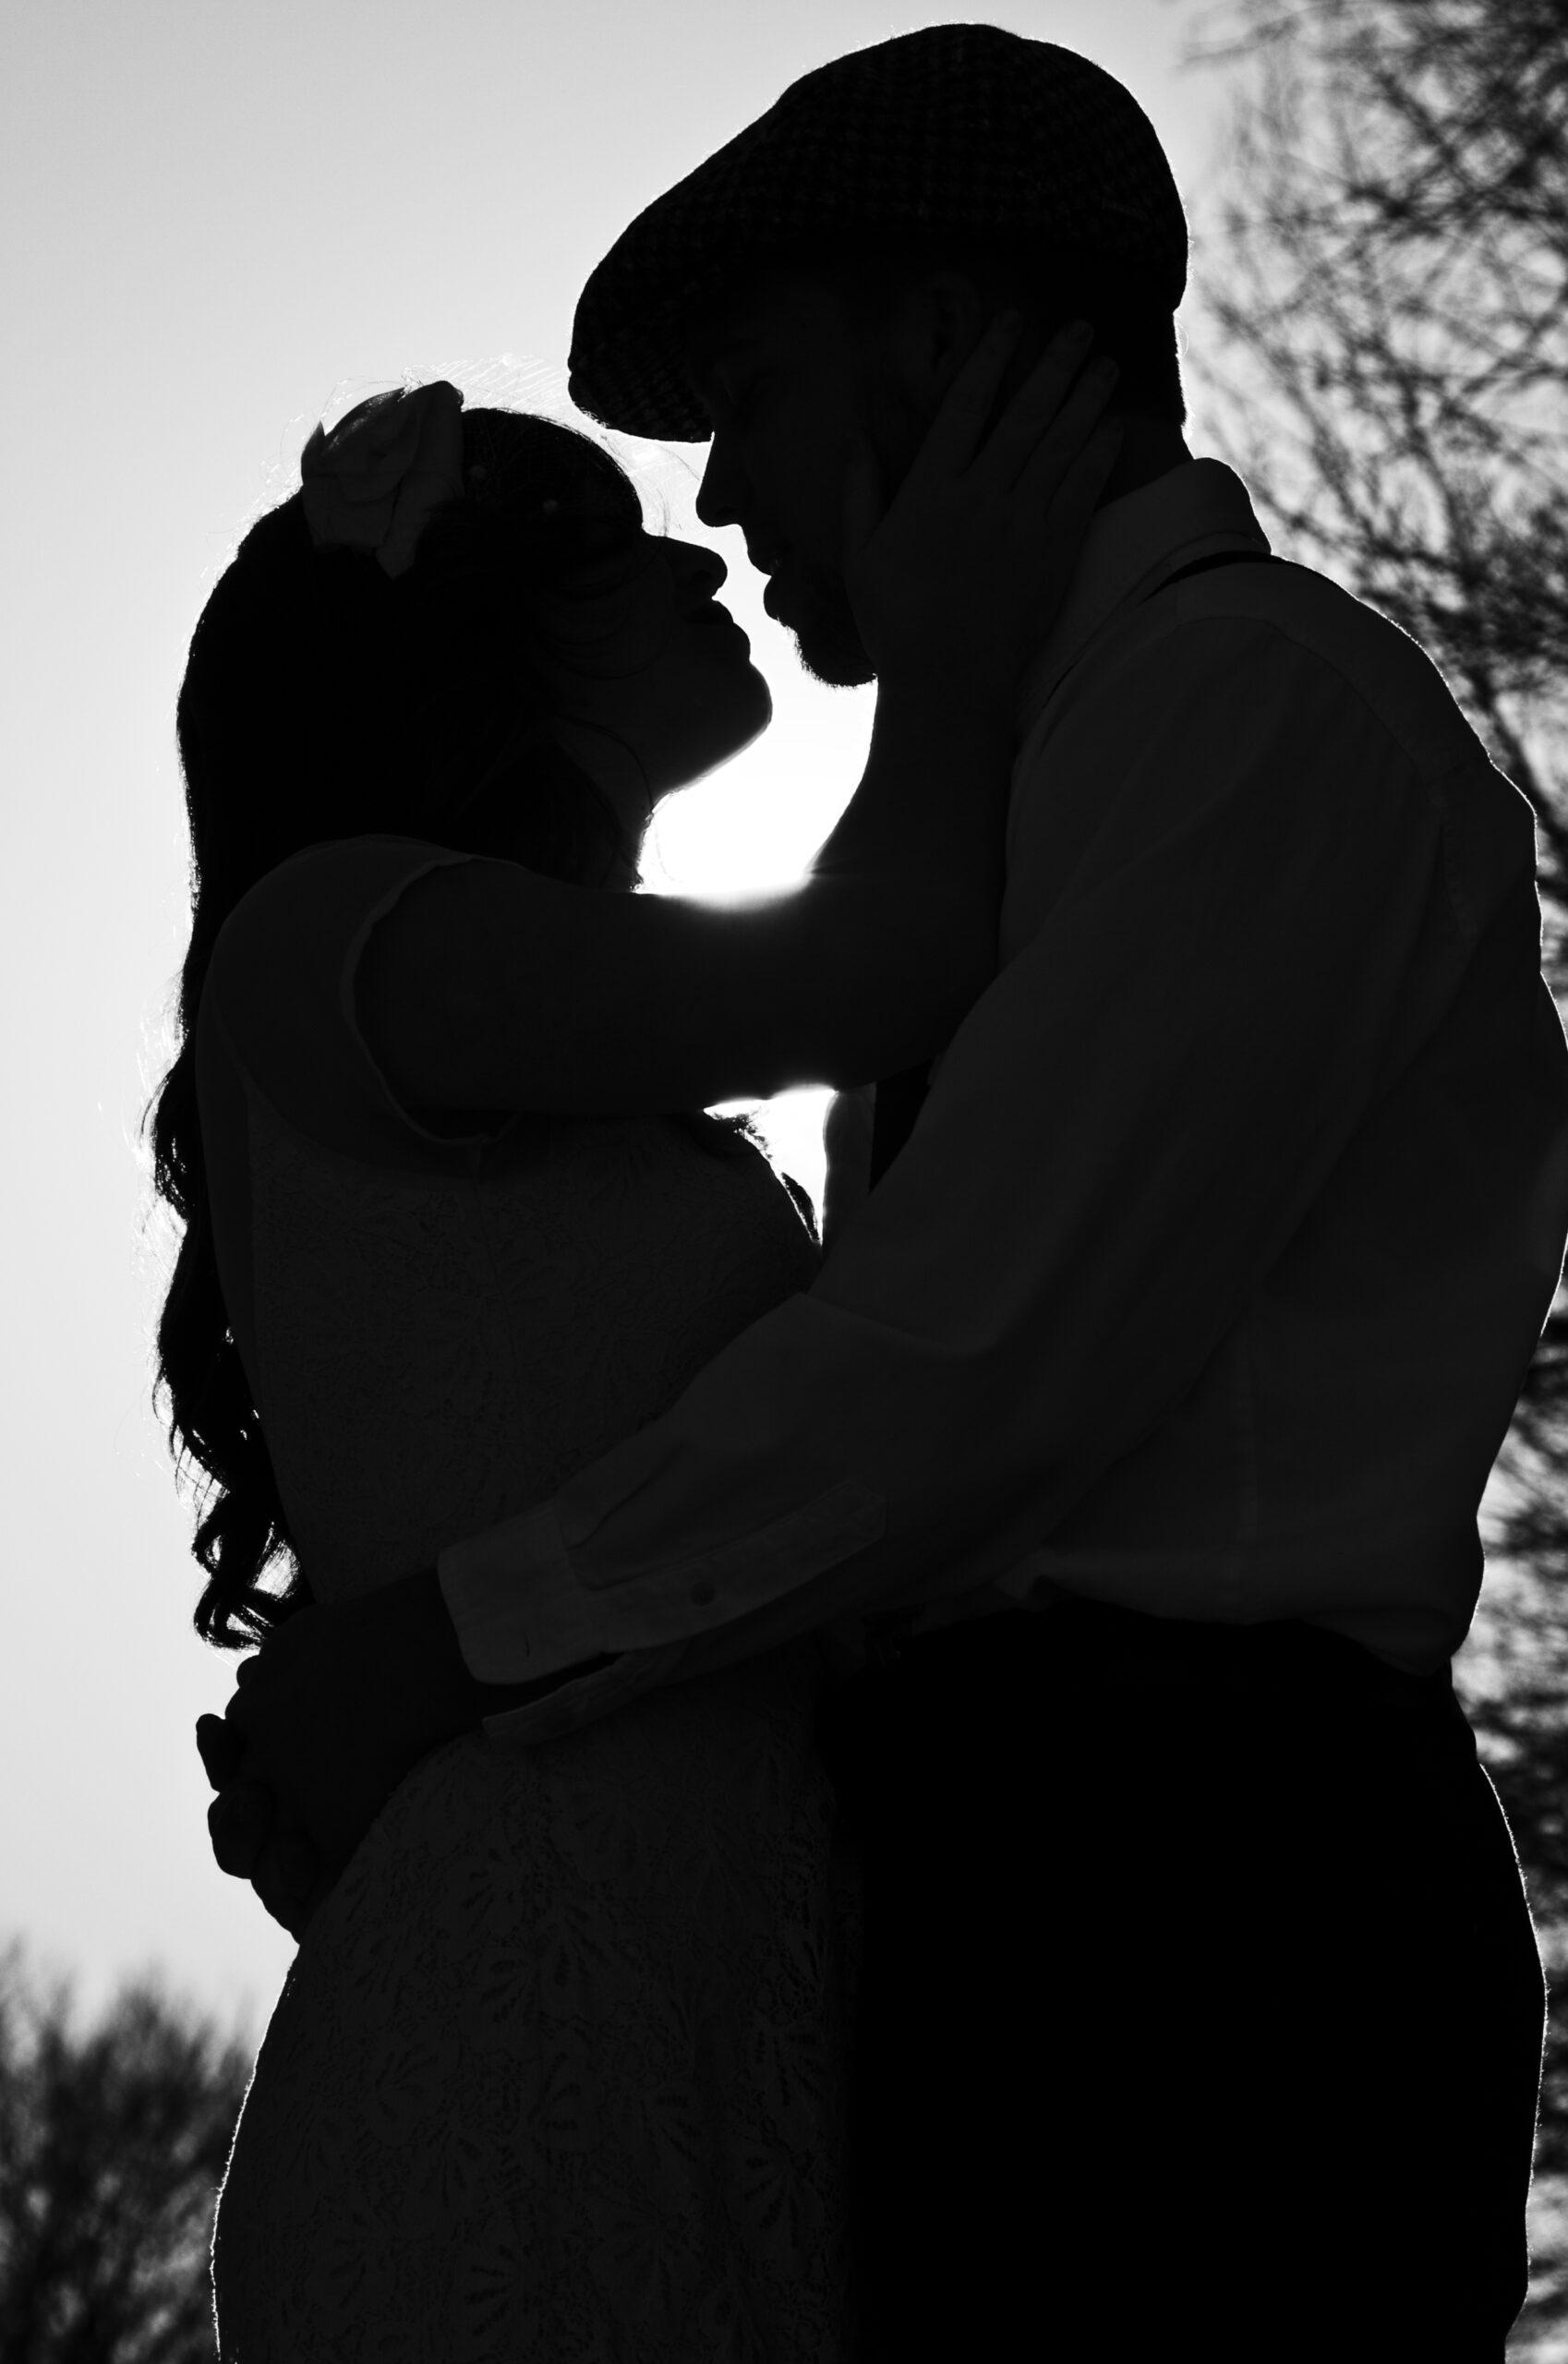 wedding planning, COVID-19, postponing wedding, small wedding